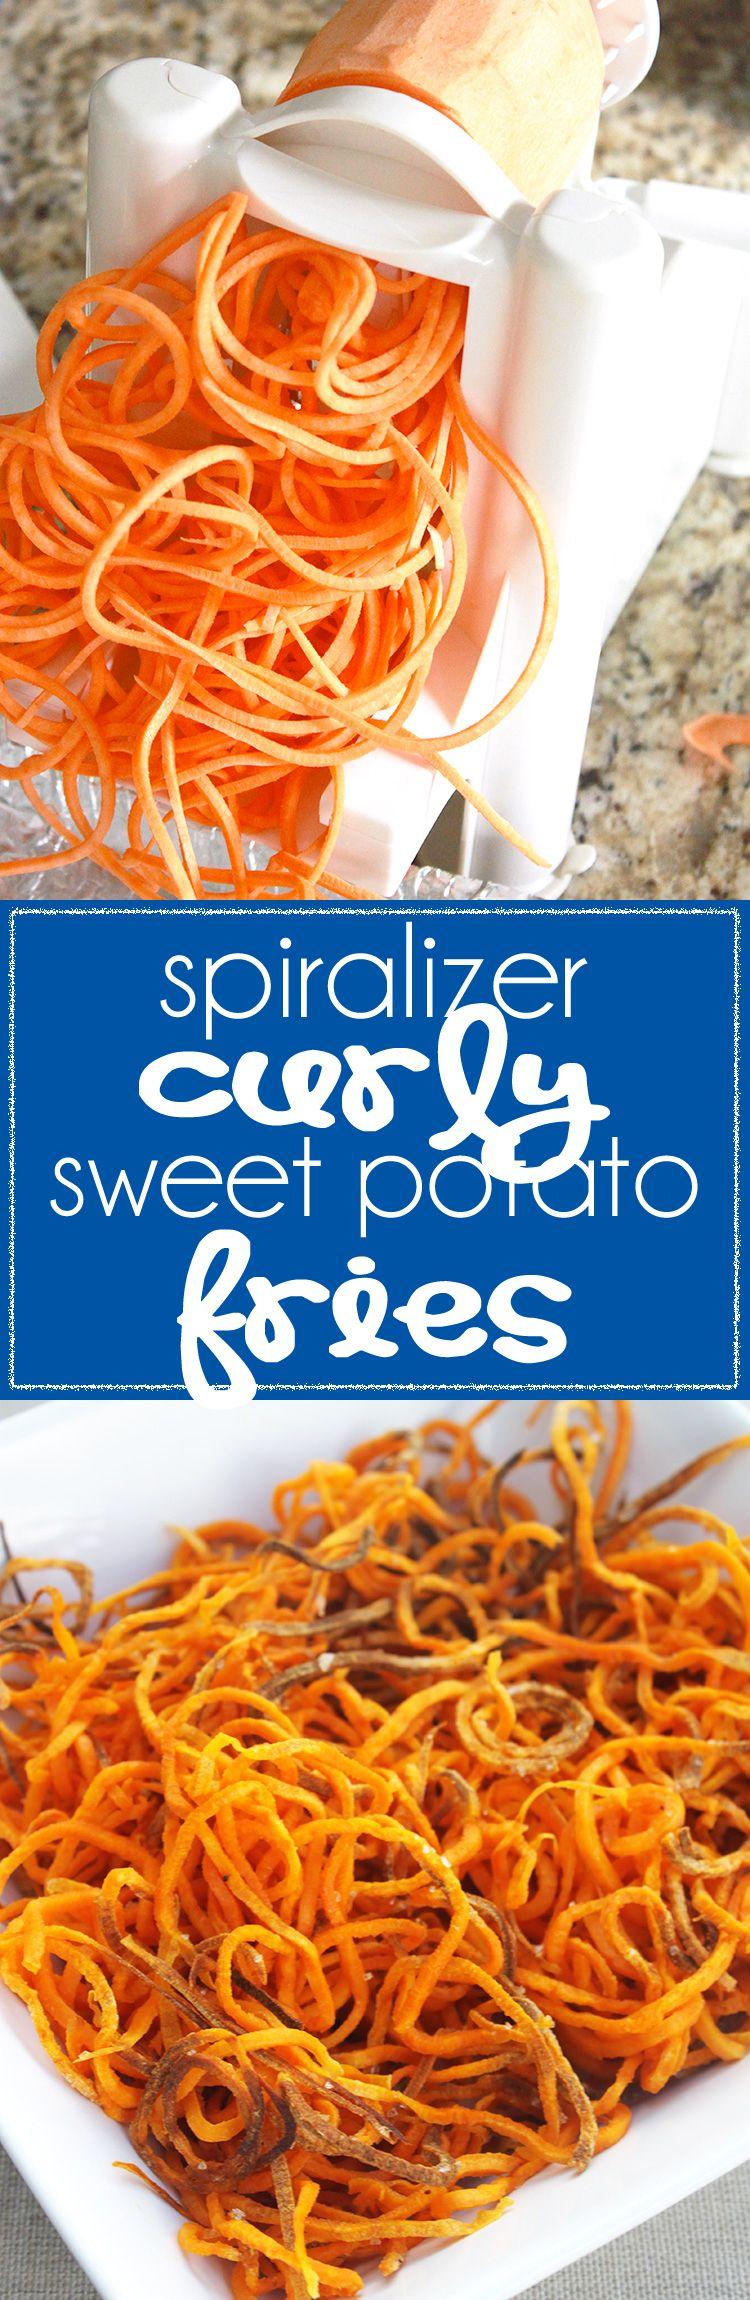 Spiralizer Curly Sweet Potato Fries Air fryer healthy